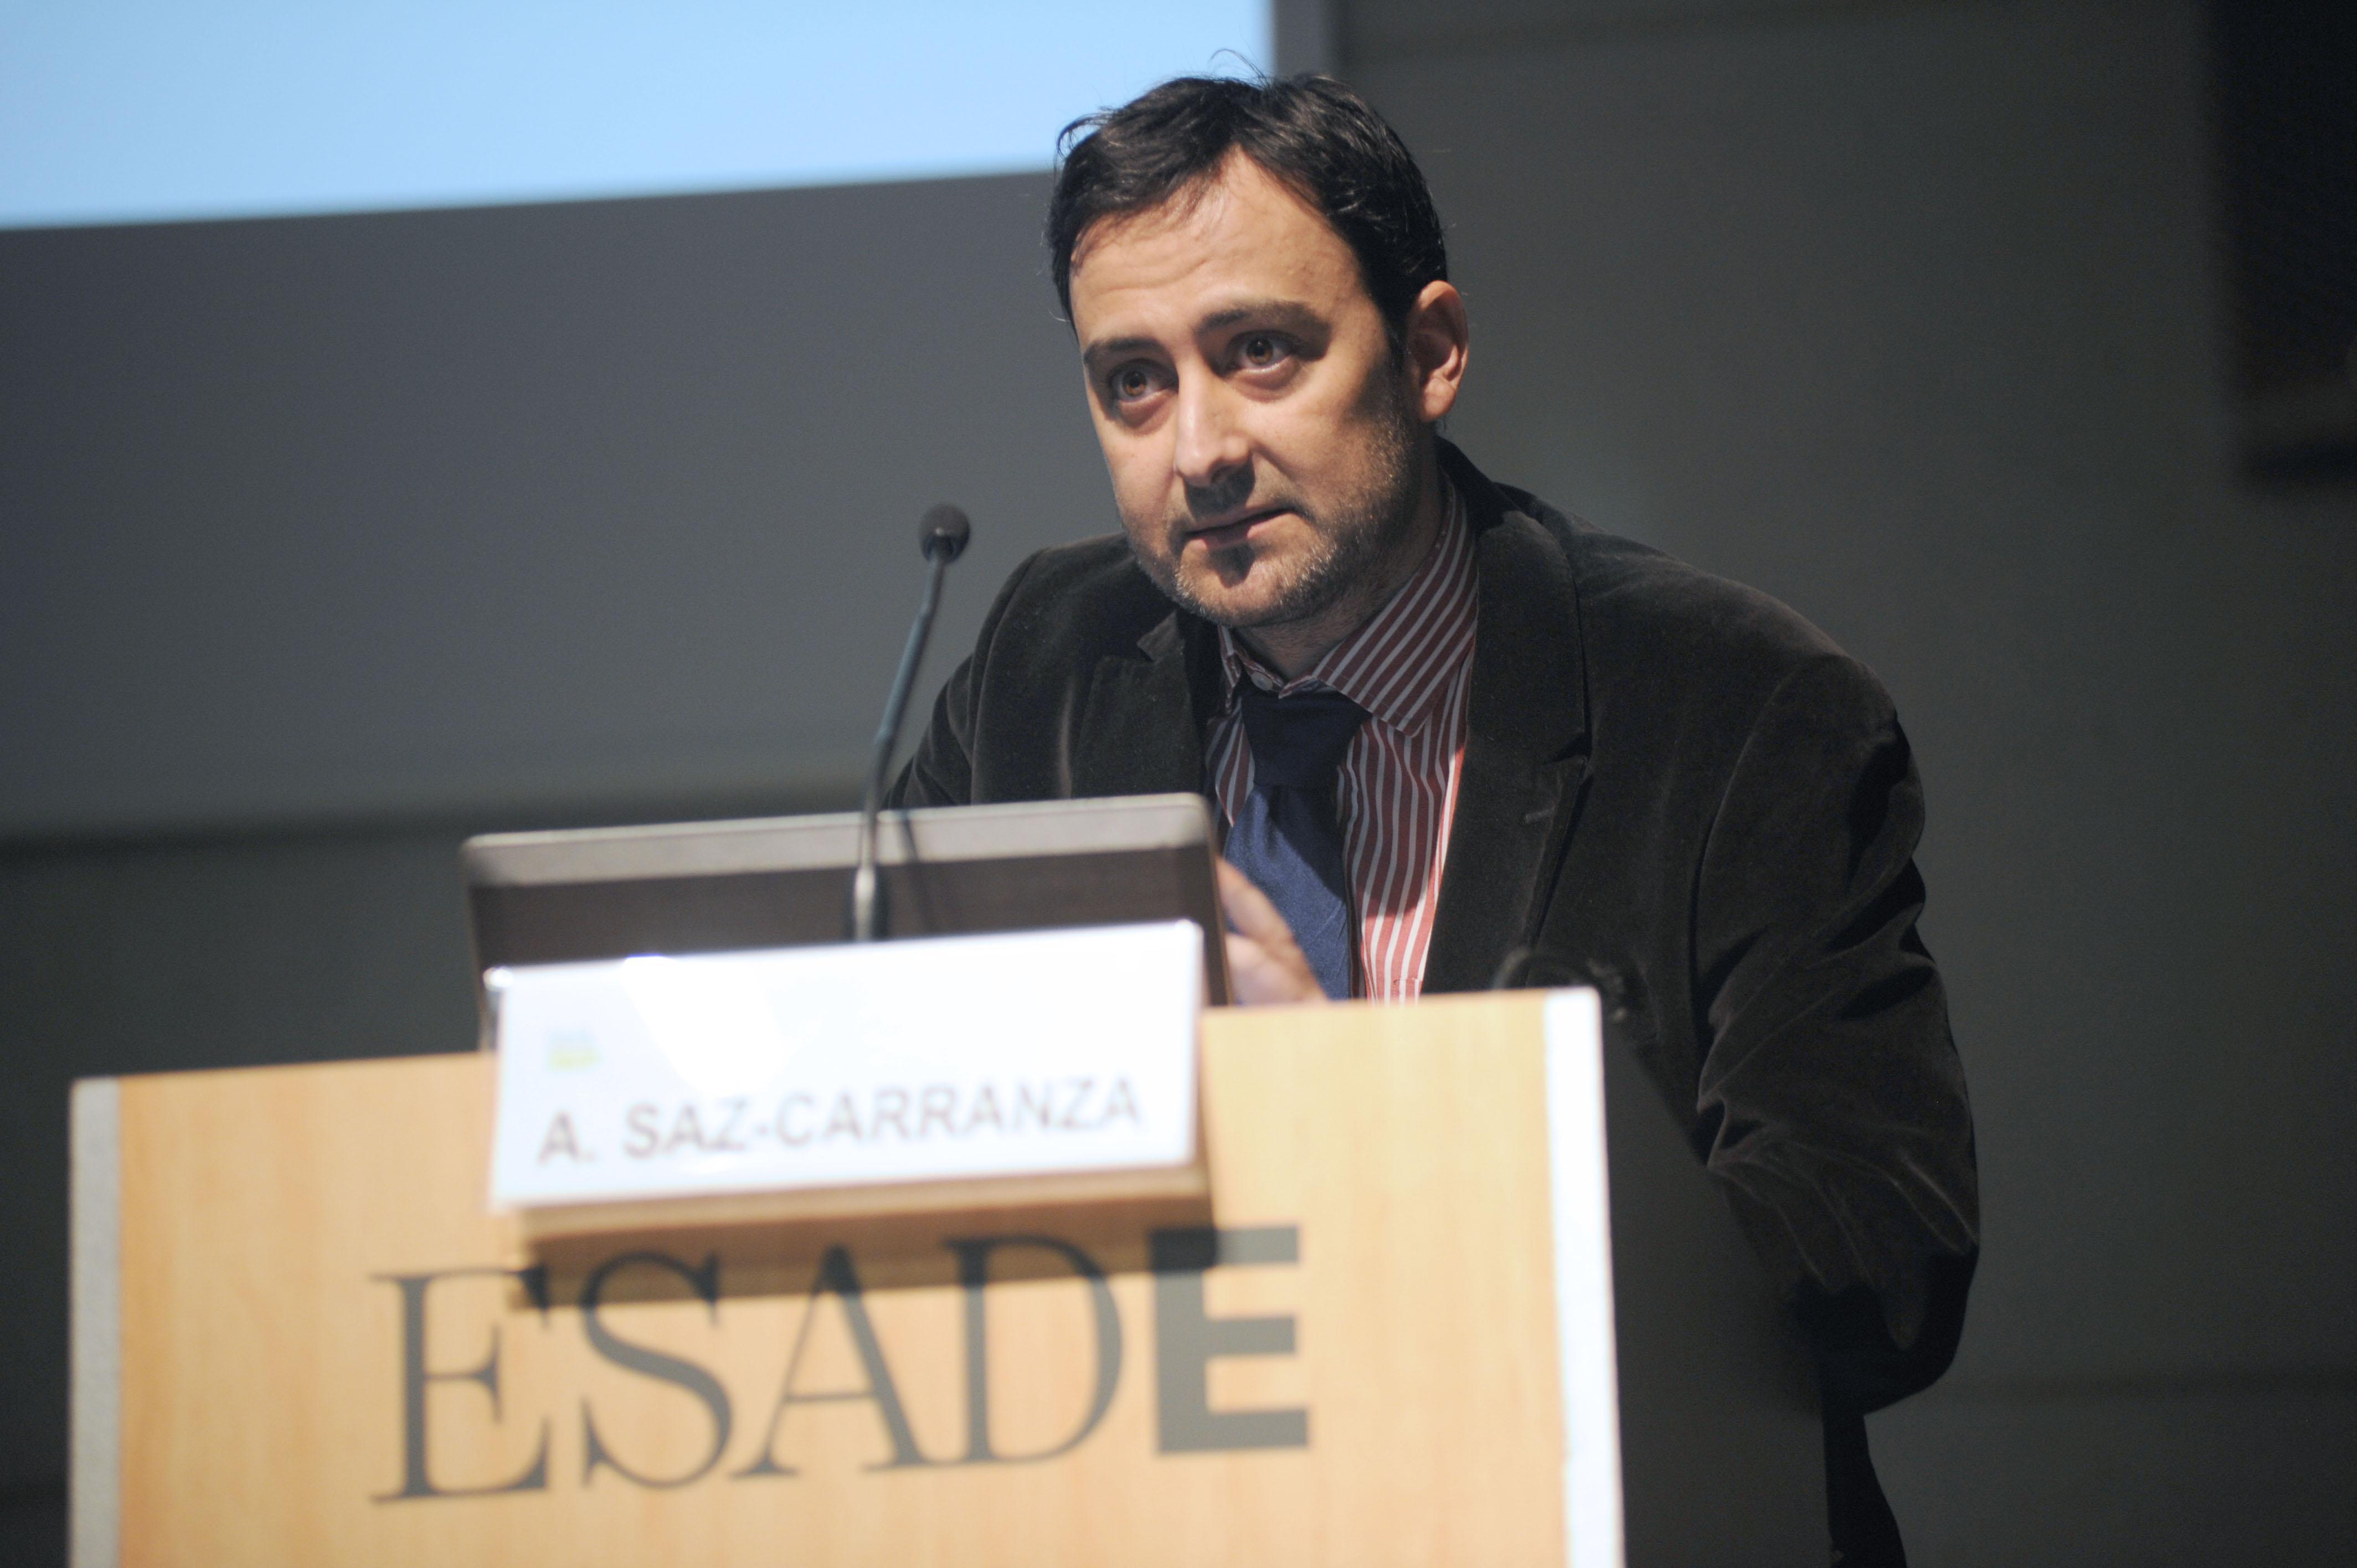 Ángel Saz-Carranza. ESADEgeo